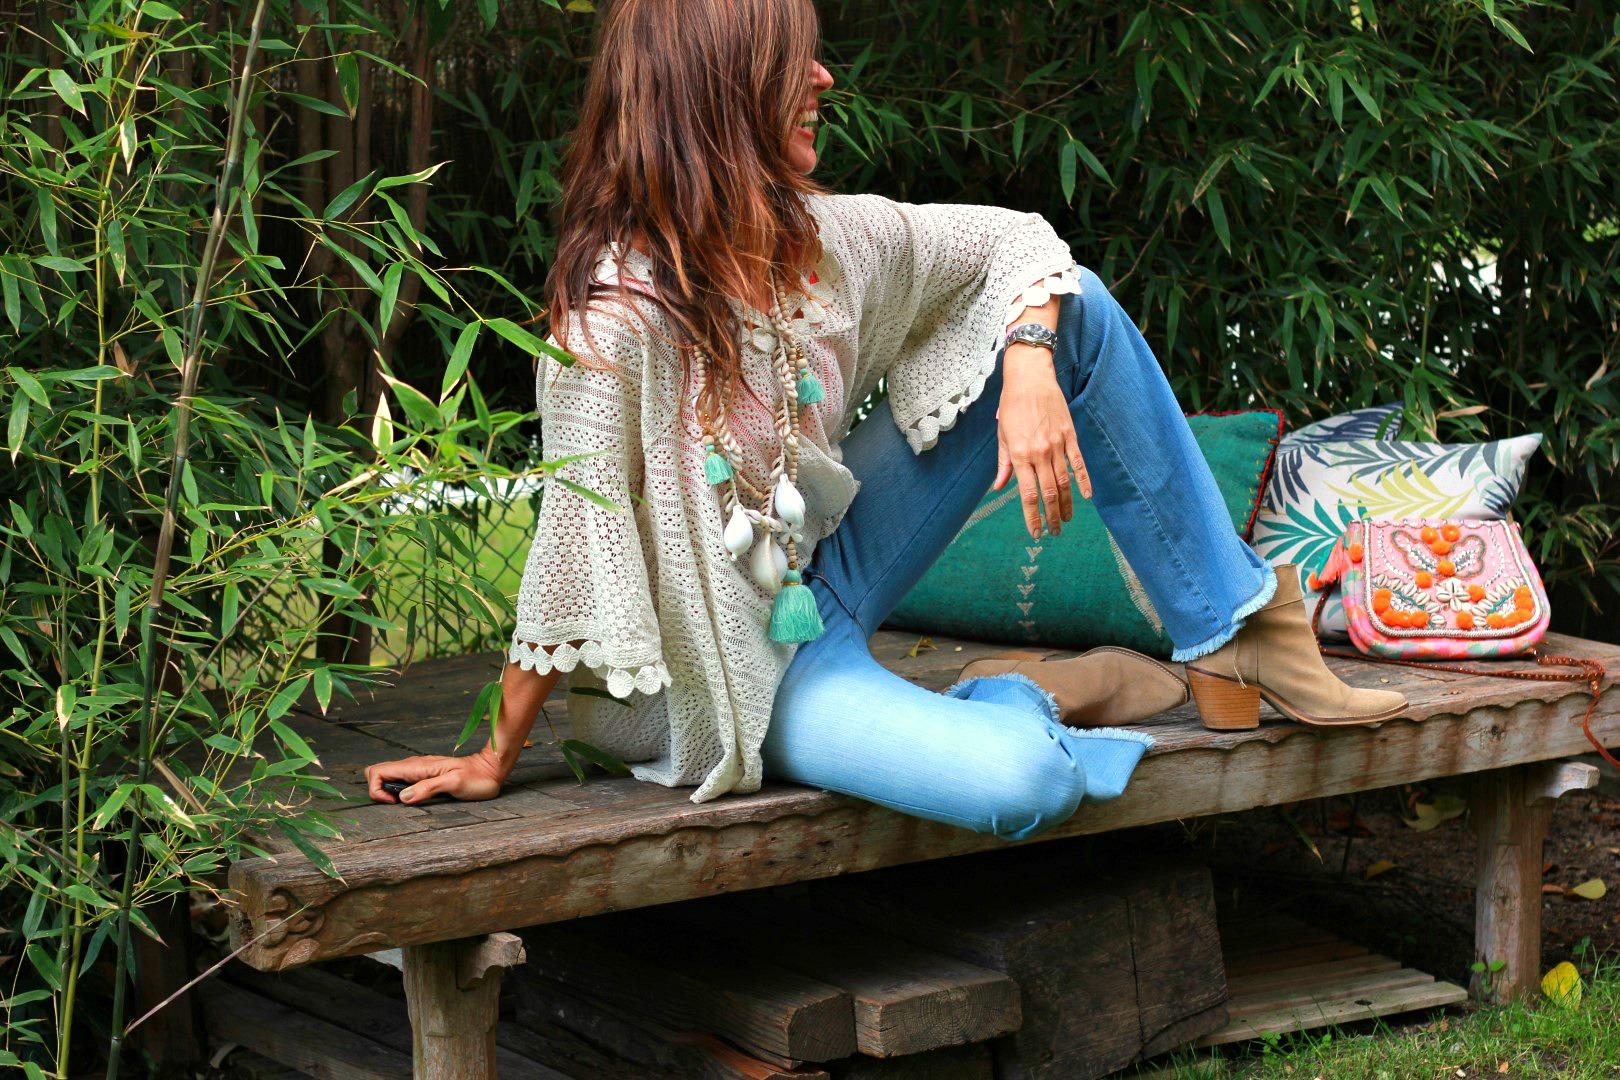 jeans 4 spring-71047-mytenida